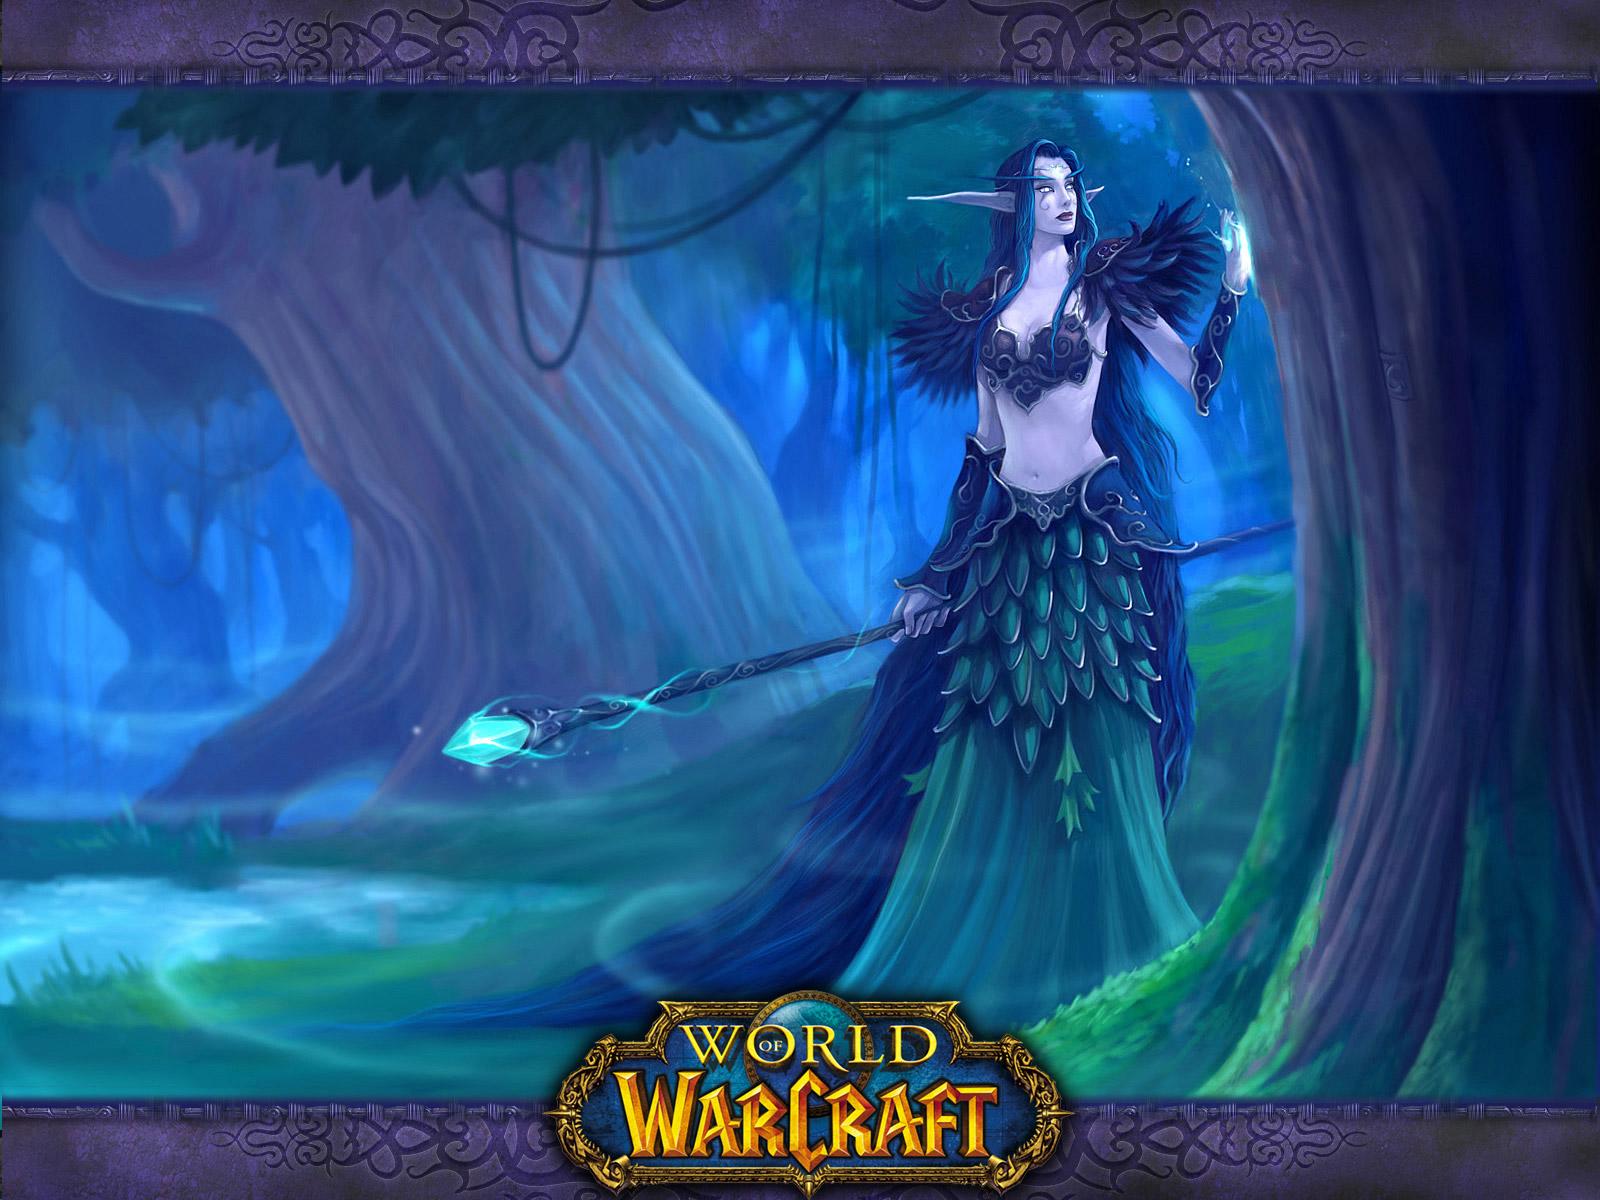 World of Warcraft wallpaper 23